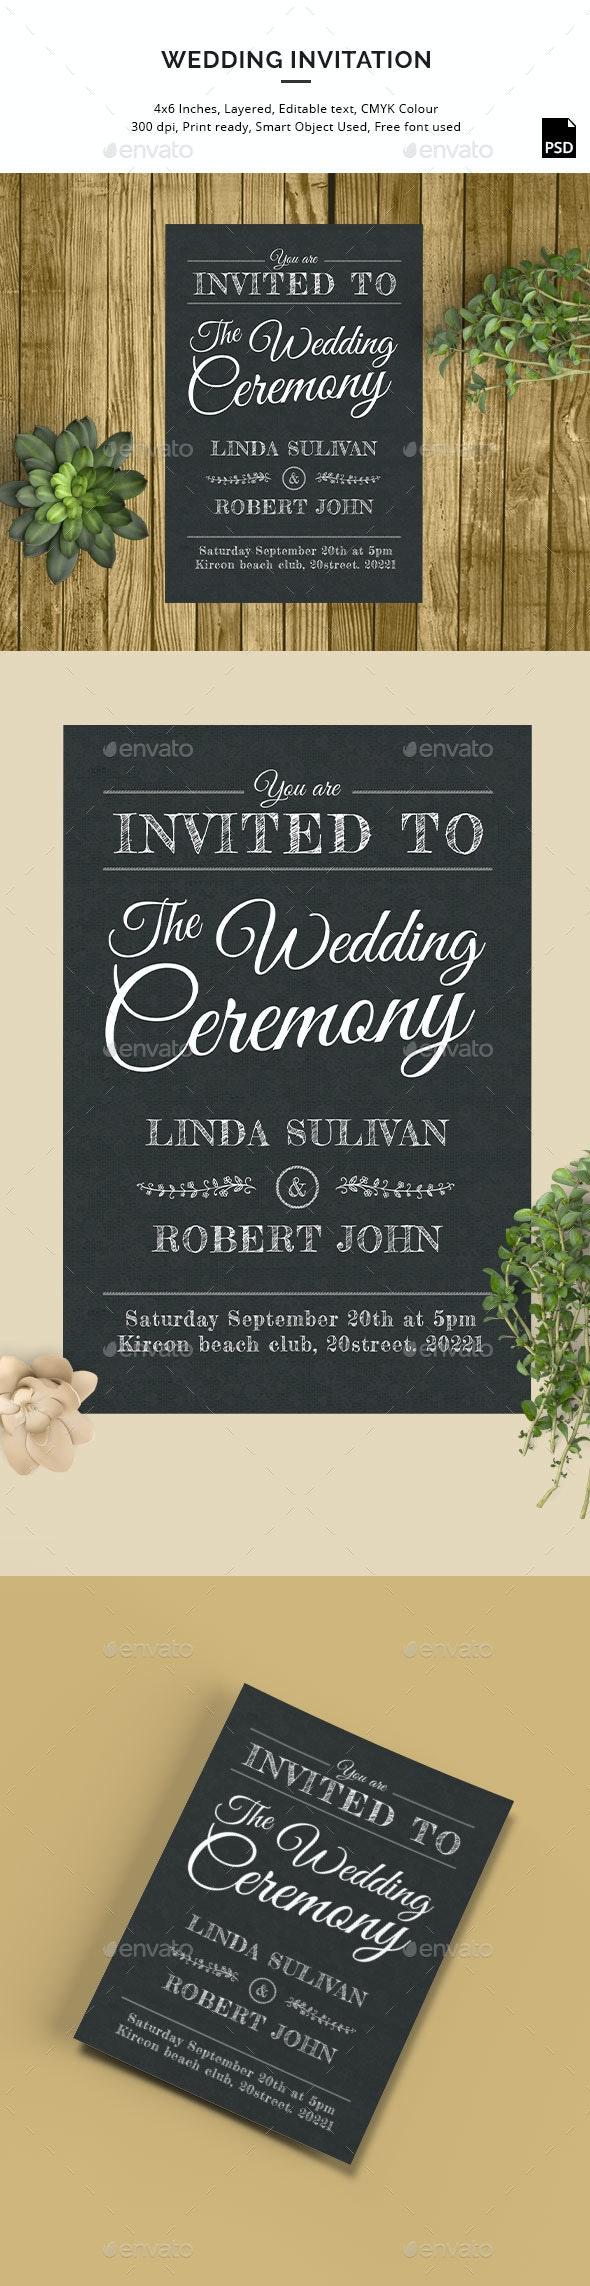 Wedding Invitation Template - Invitations Cards & Invites